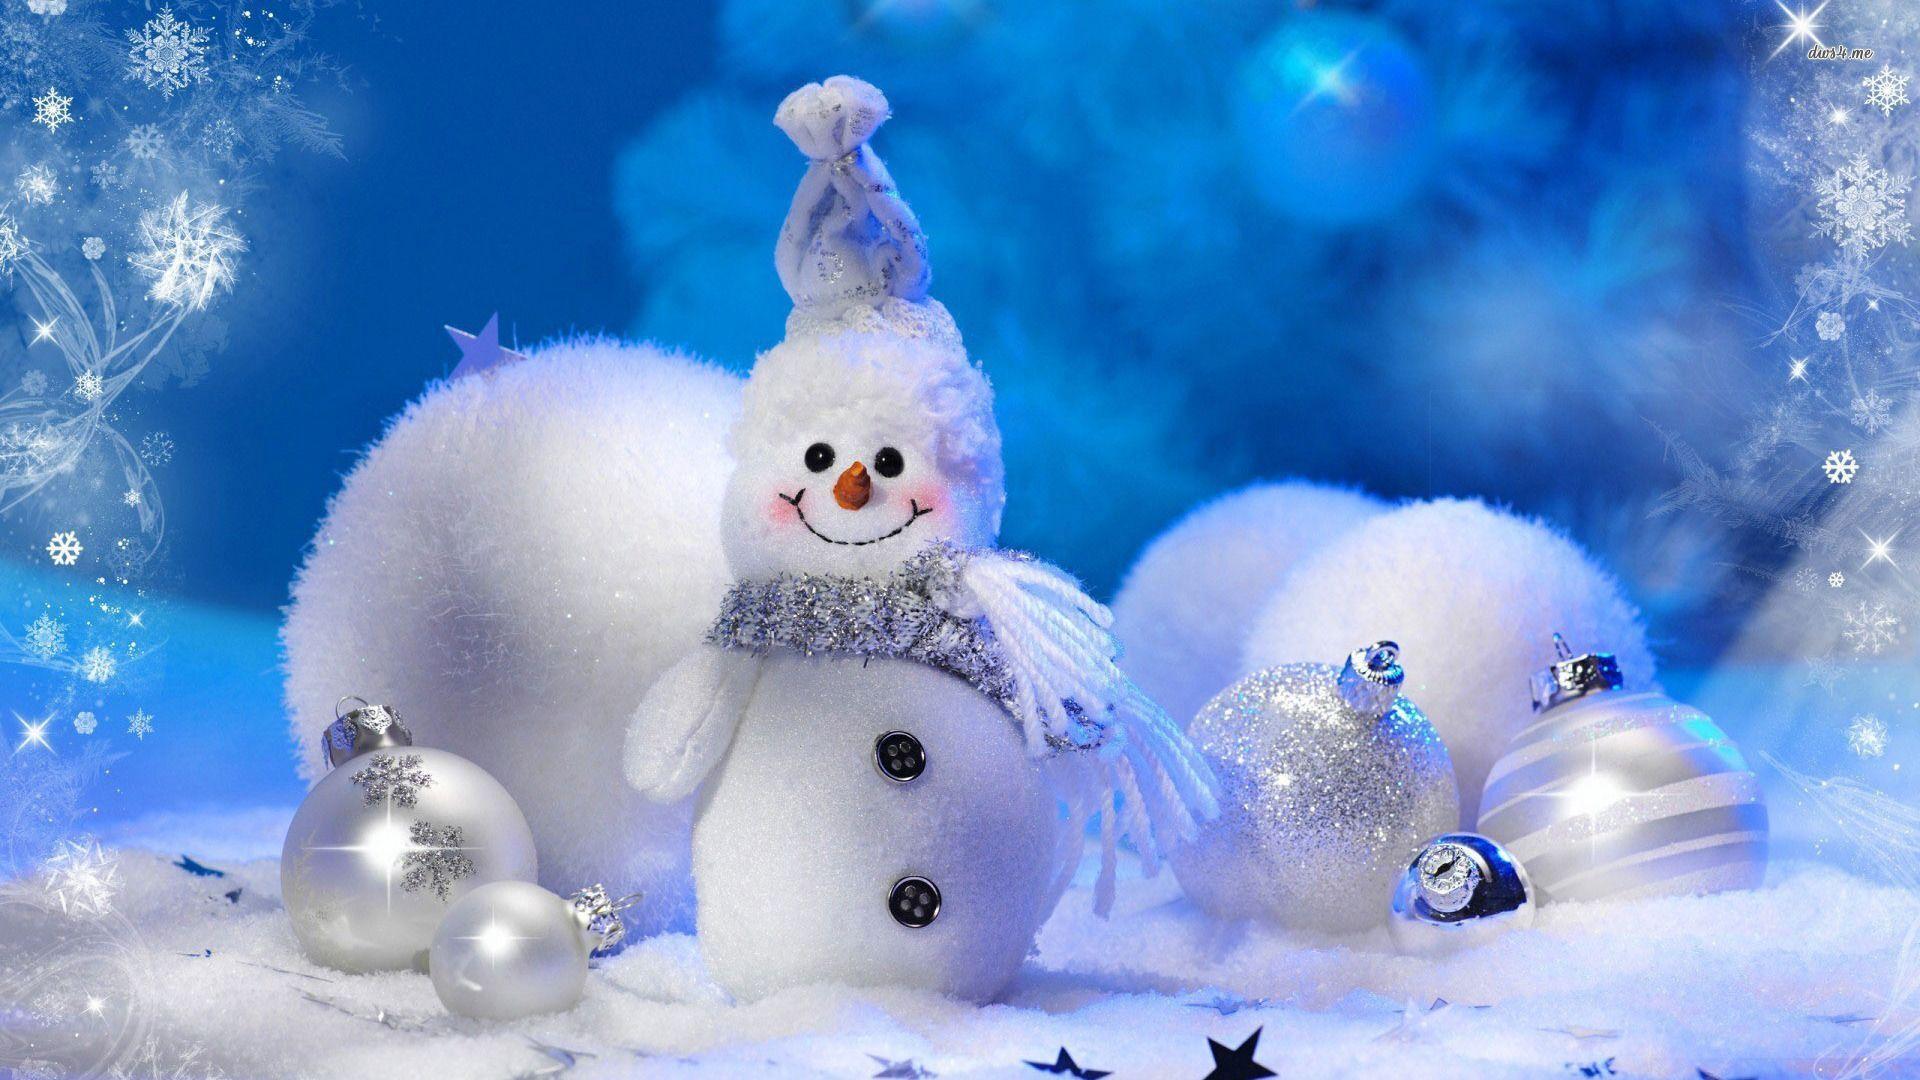 Beautiful Wallpaper Christmas Chromebook - 11b7587a49499d2d741b11ca06aa0243  Trends_111957 .jpg